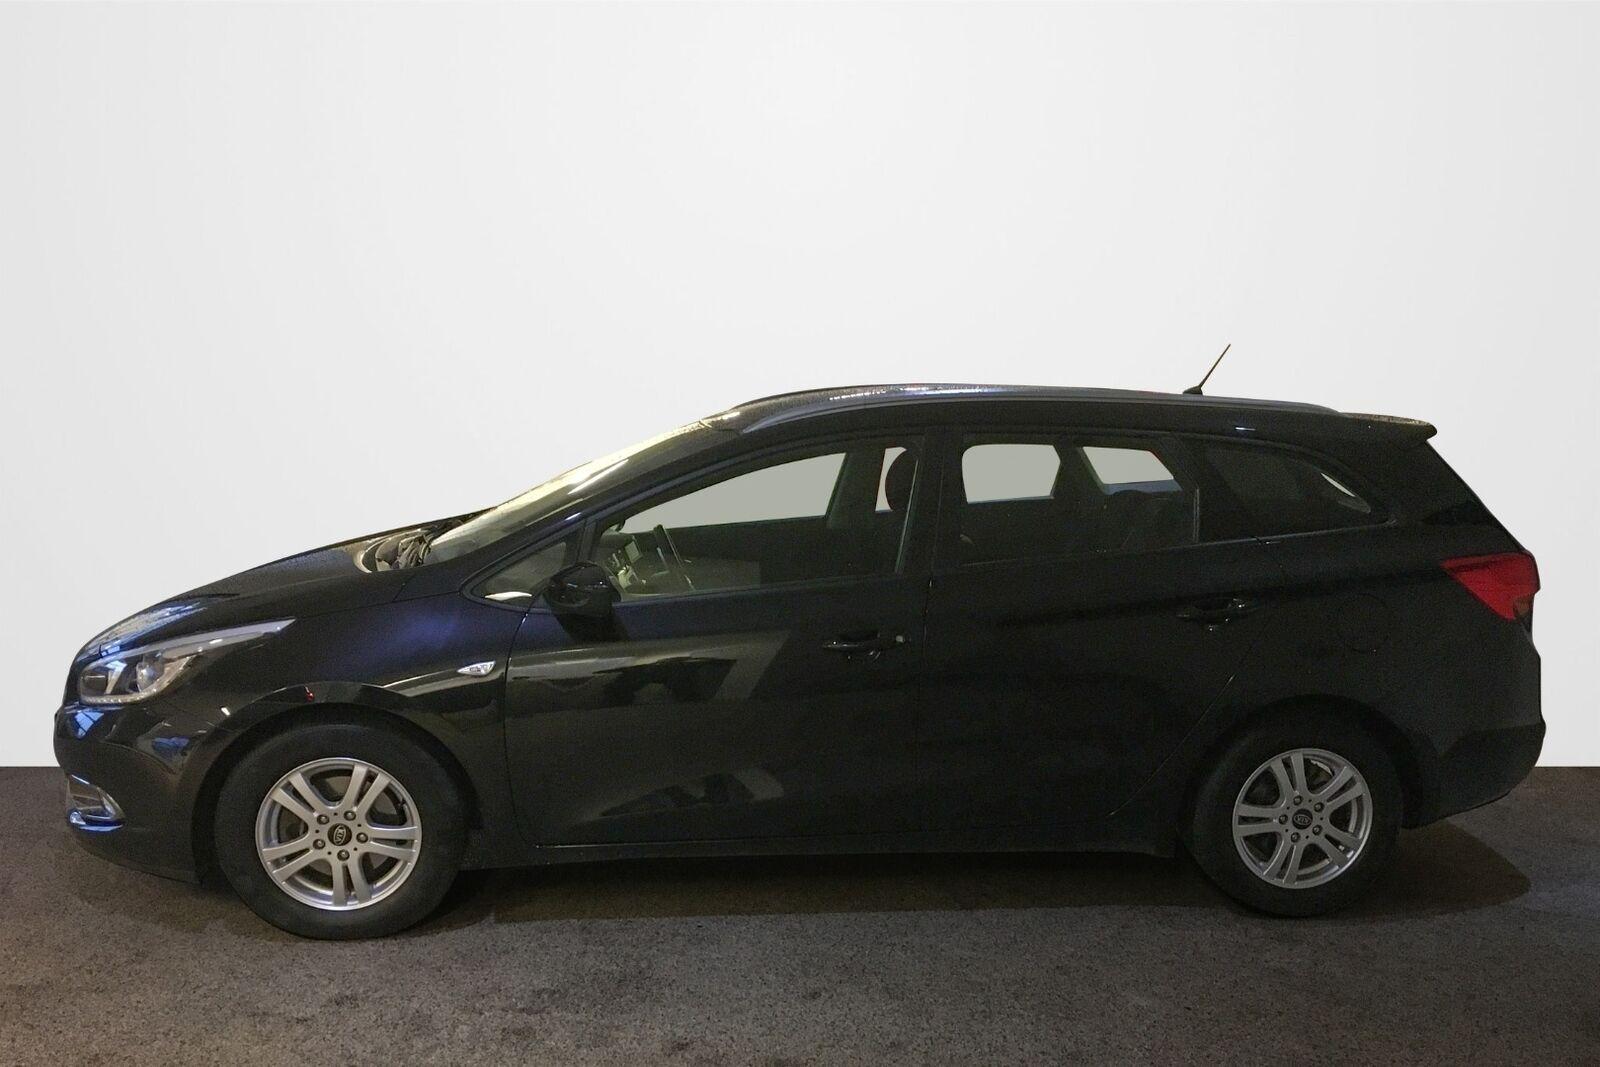 Kia Ceed 1,4 CVVT Style+ Clim SW - billede 1